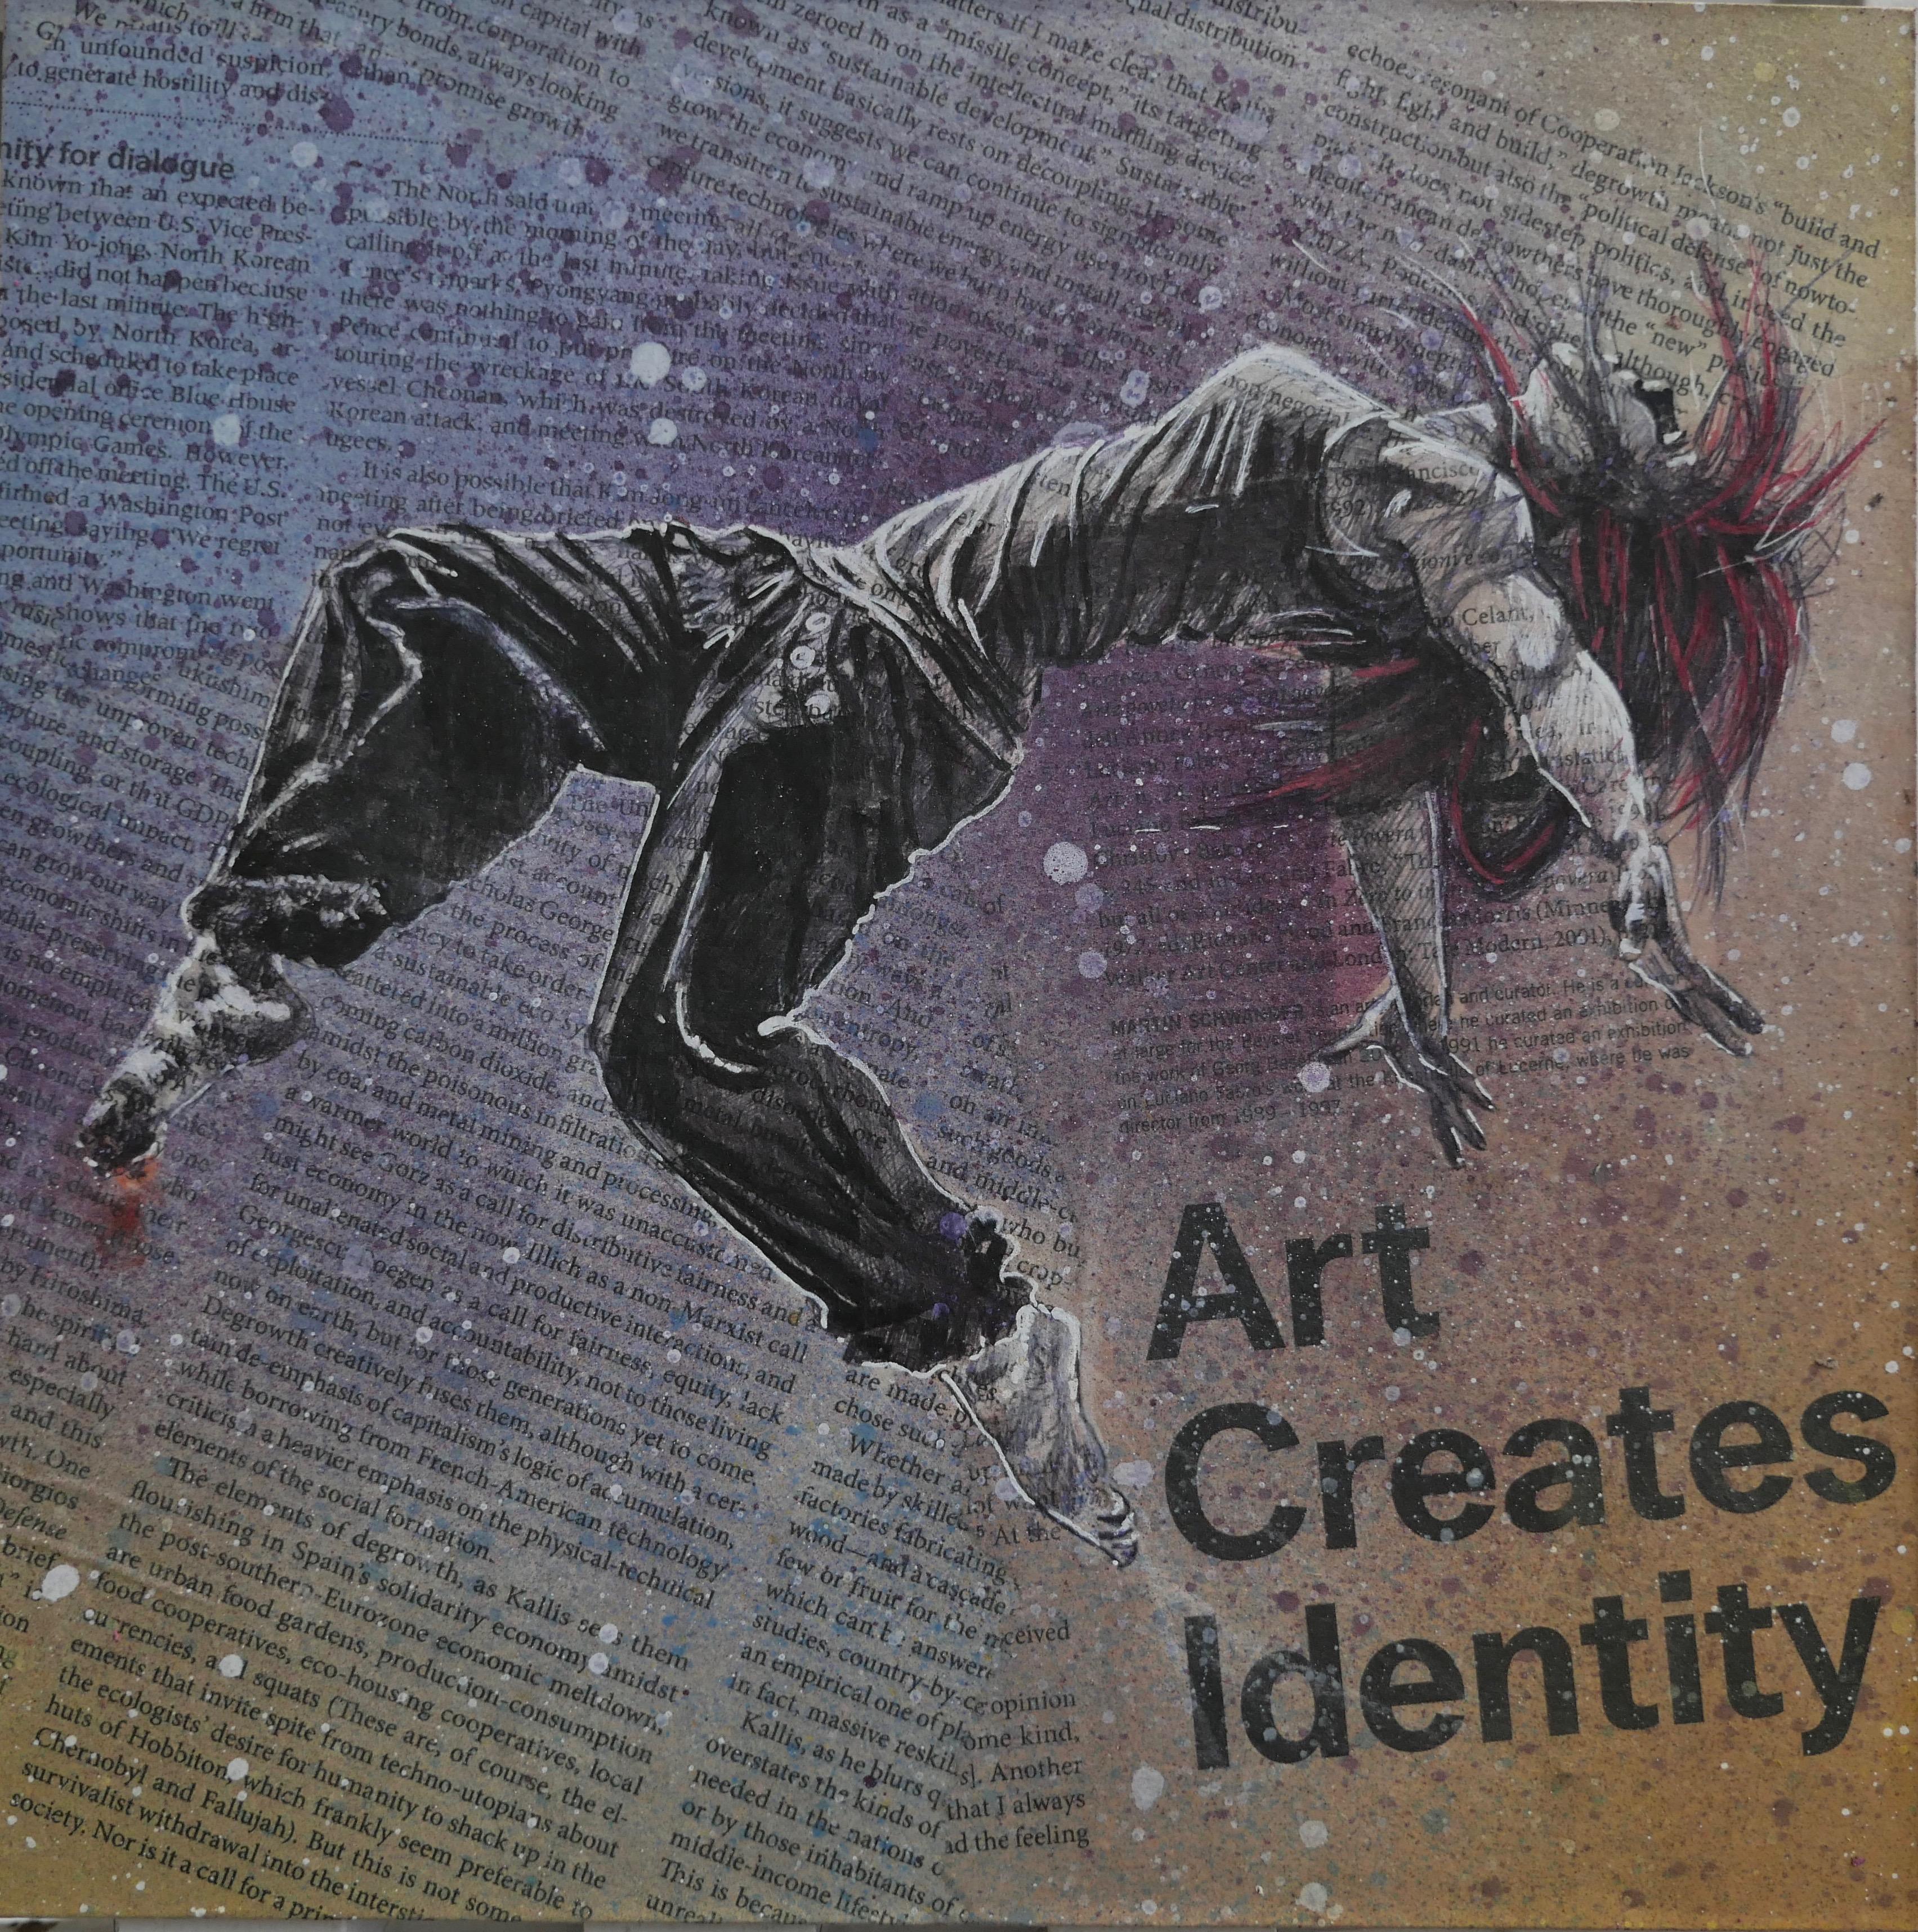 F3_Art creates identity